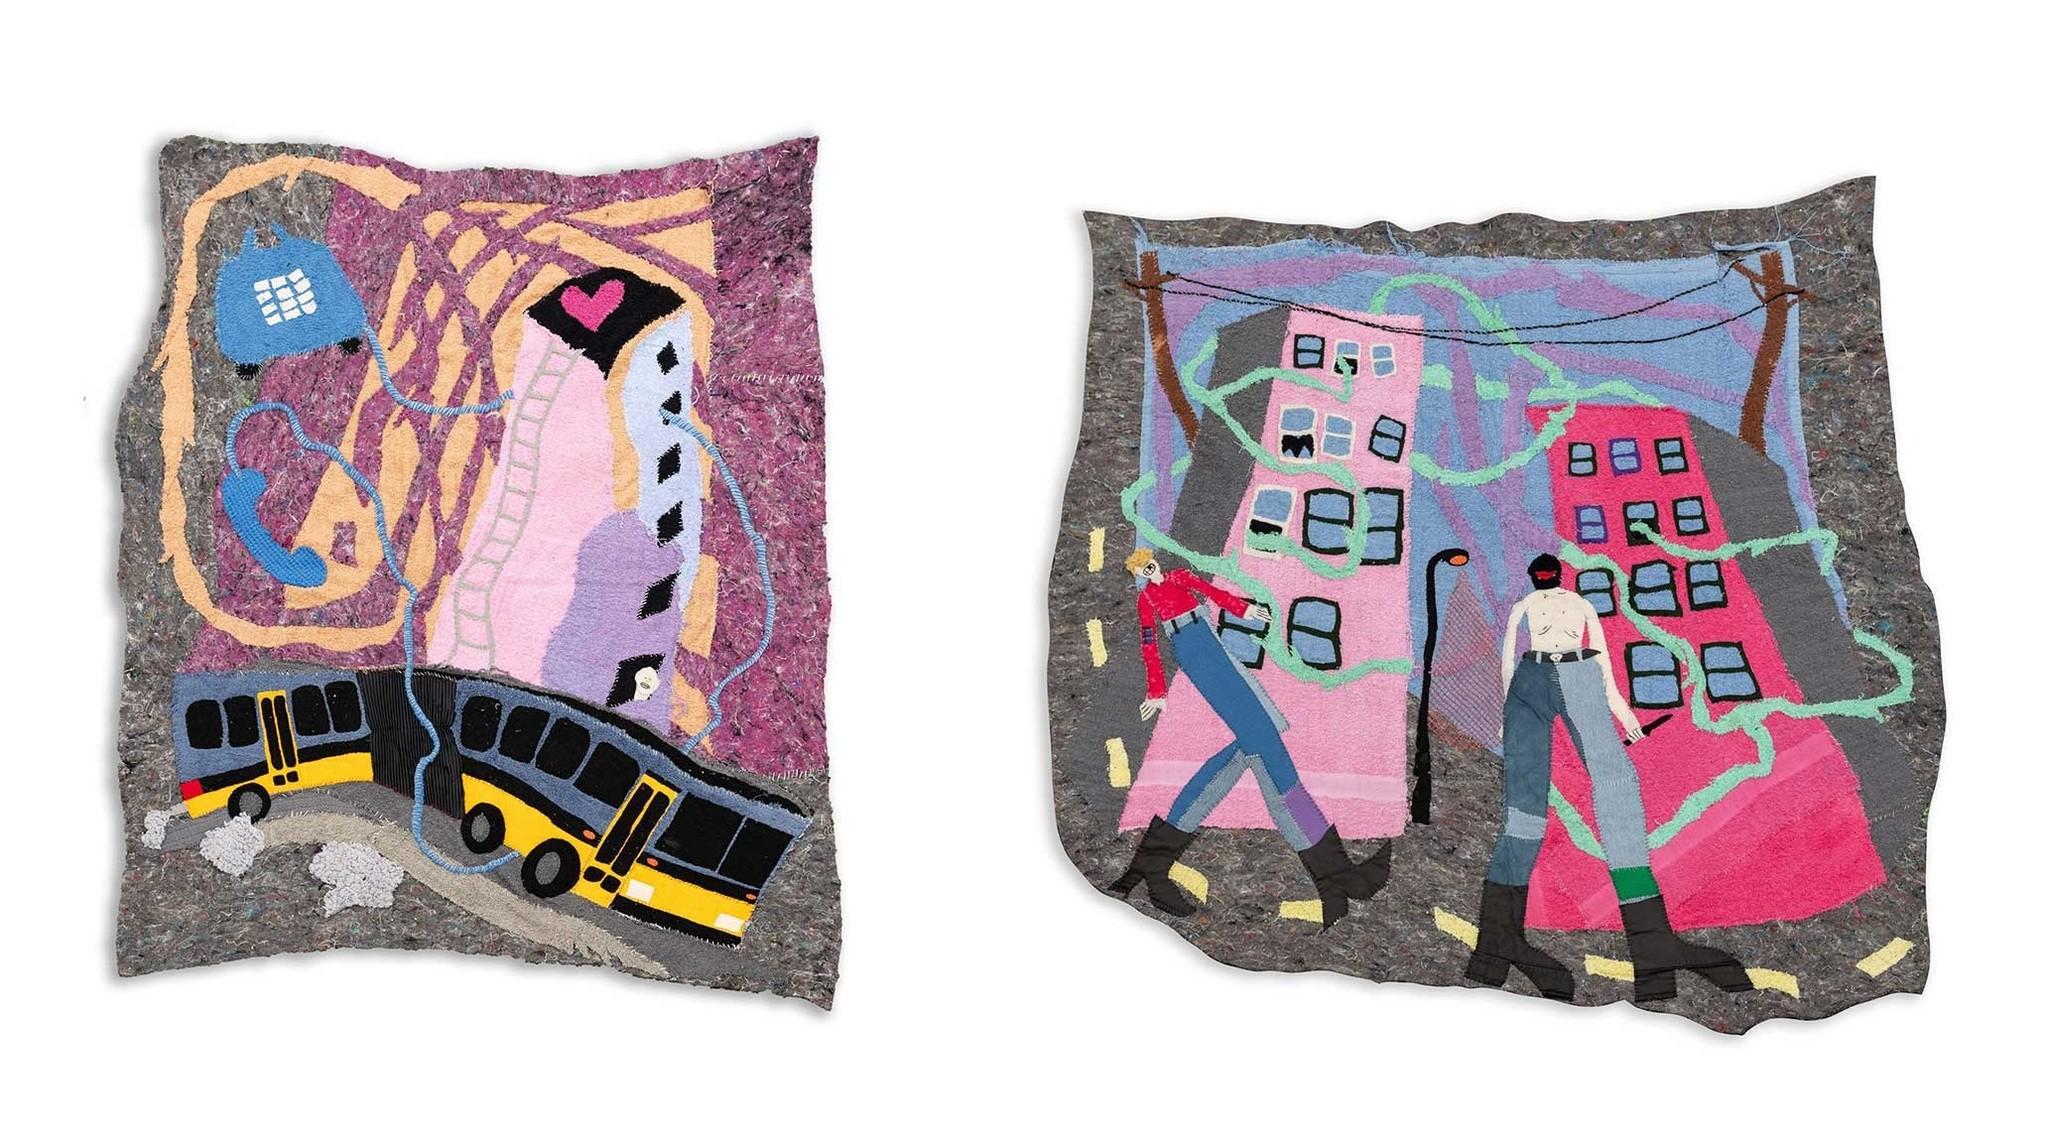 fabric artwork